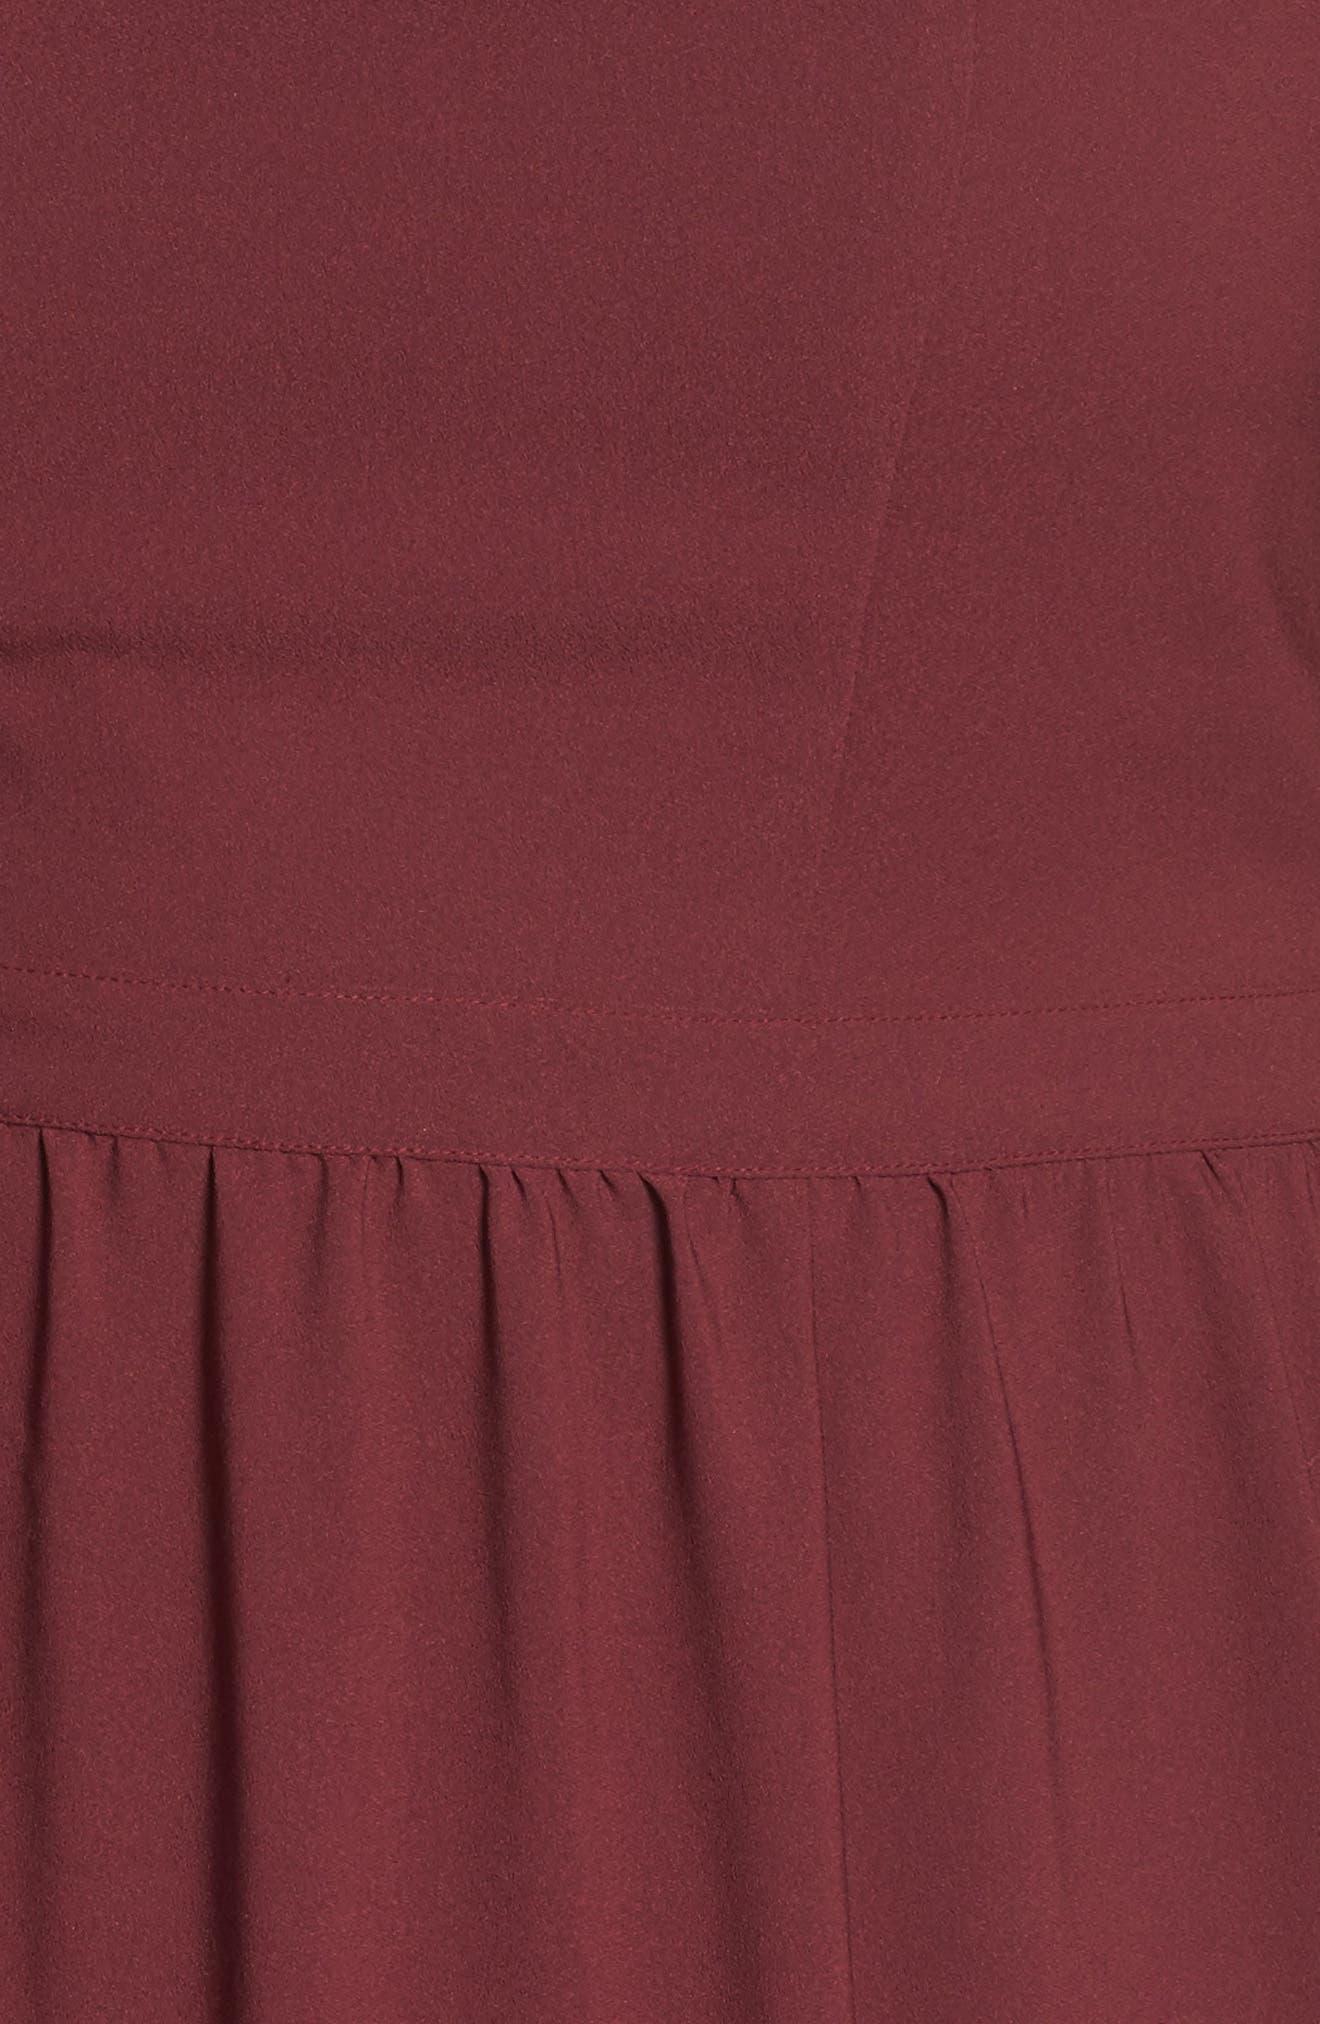 Cold Shoulder Midi Dress,                             Alternate thumbnail 5, color,                             930